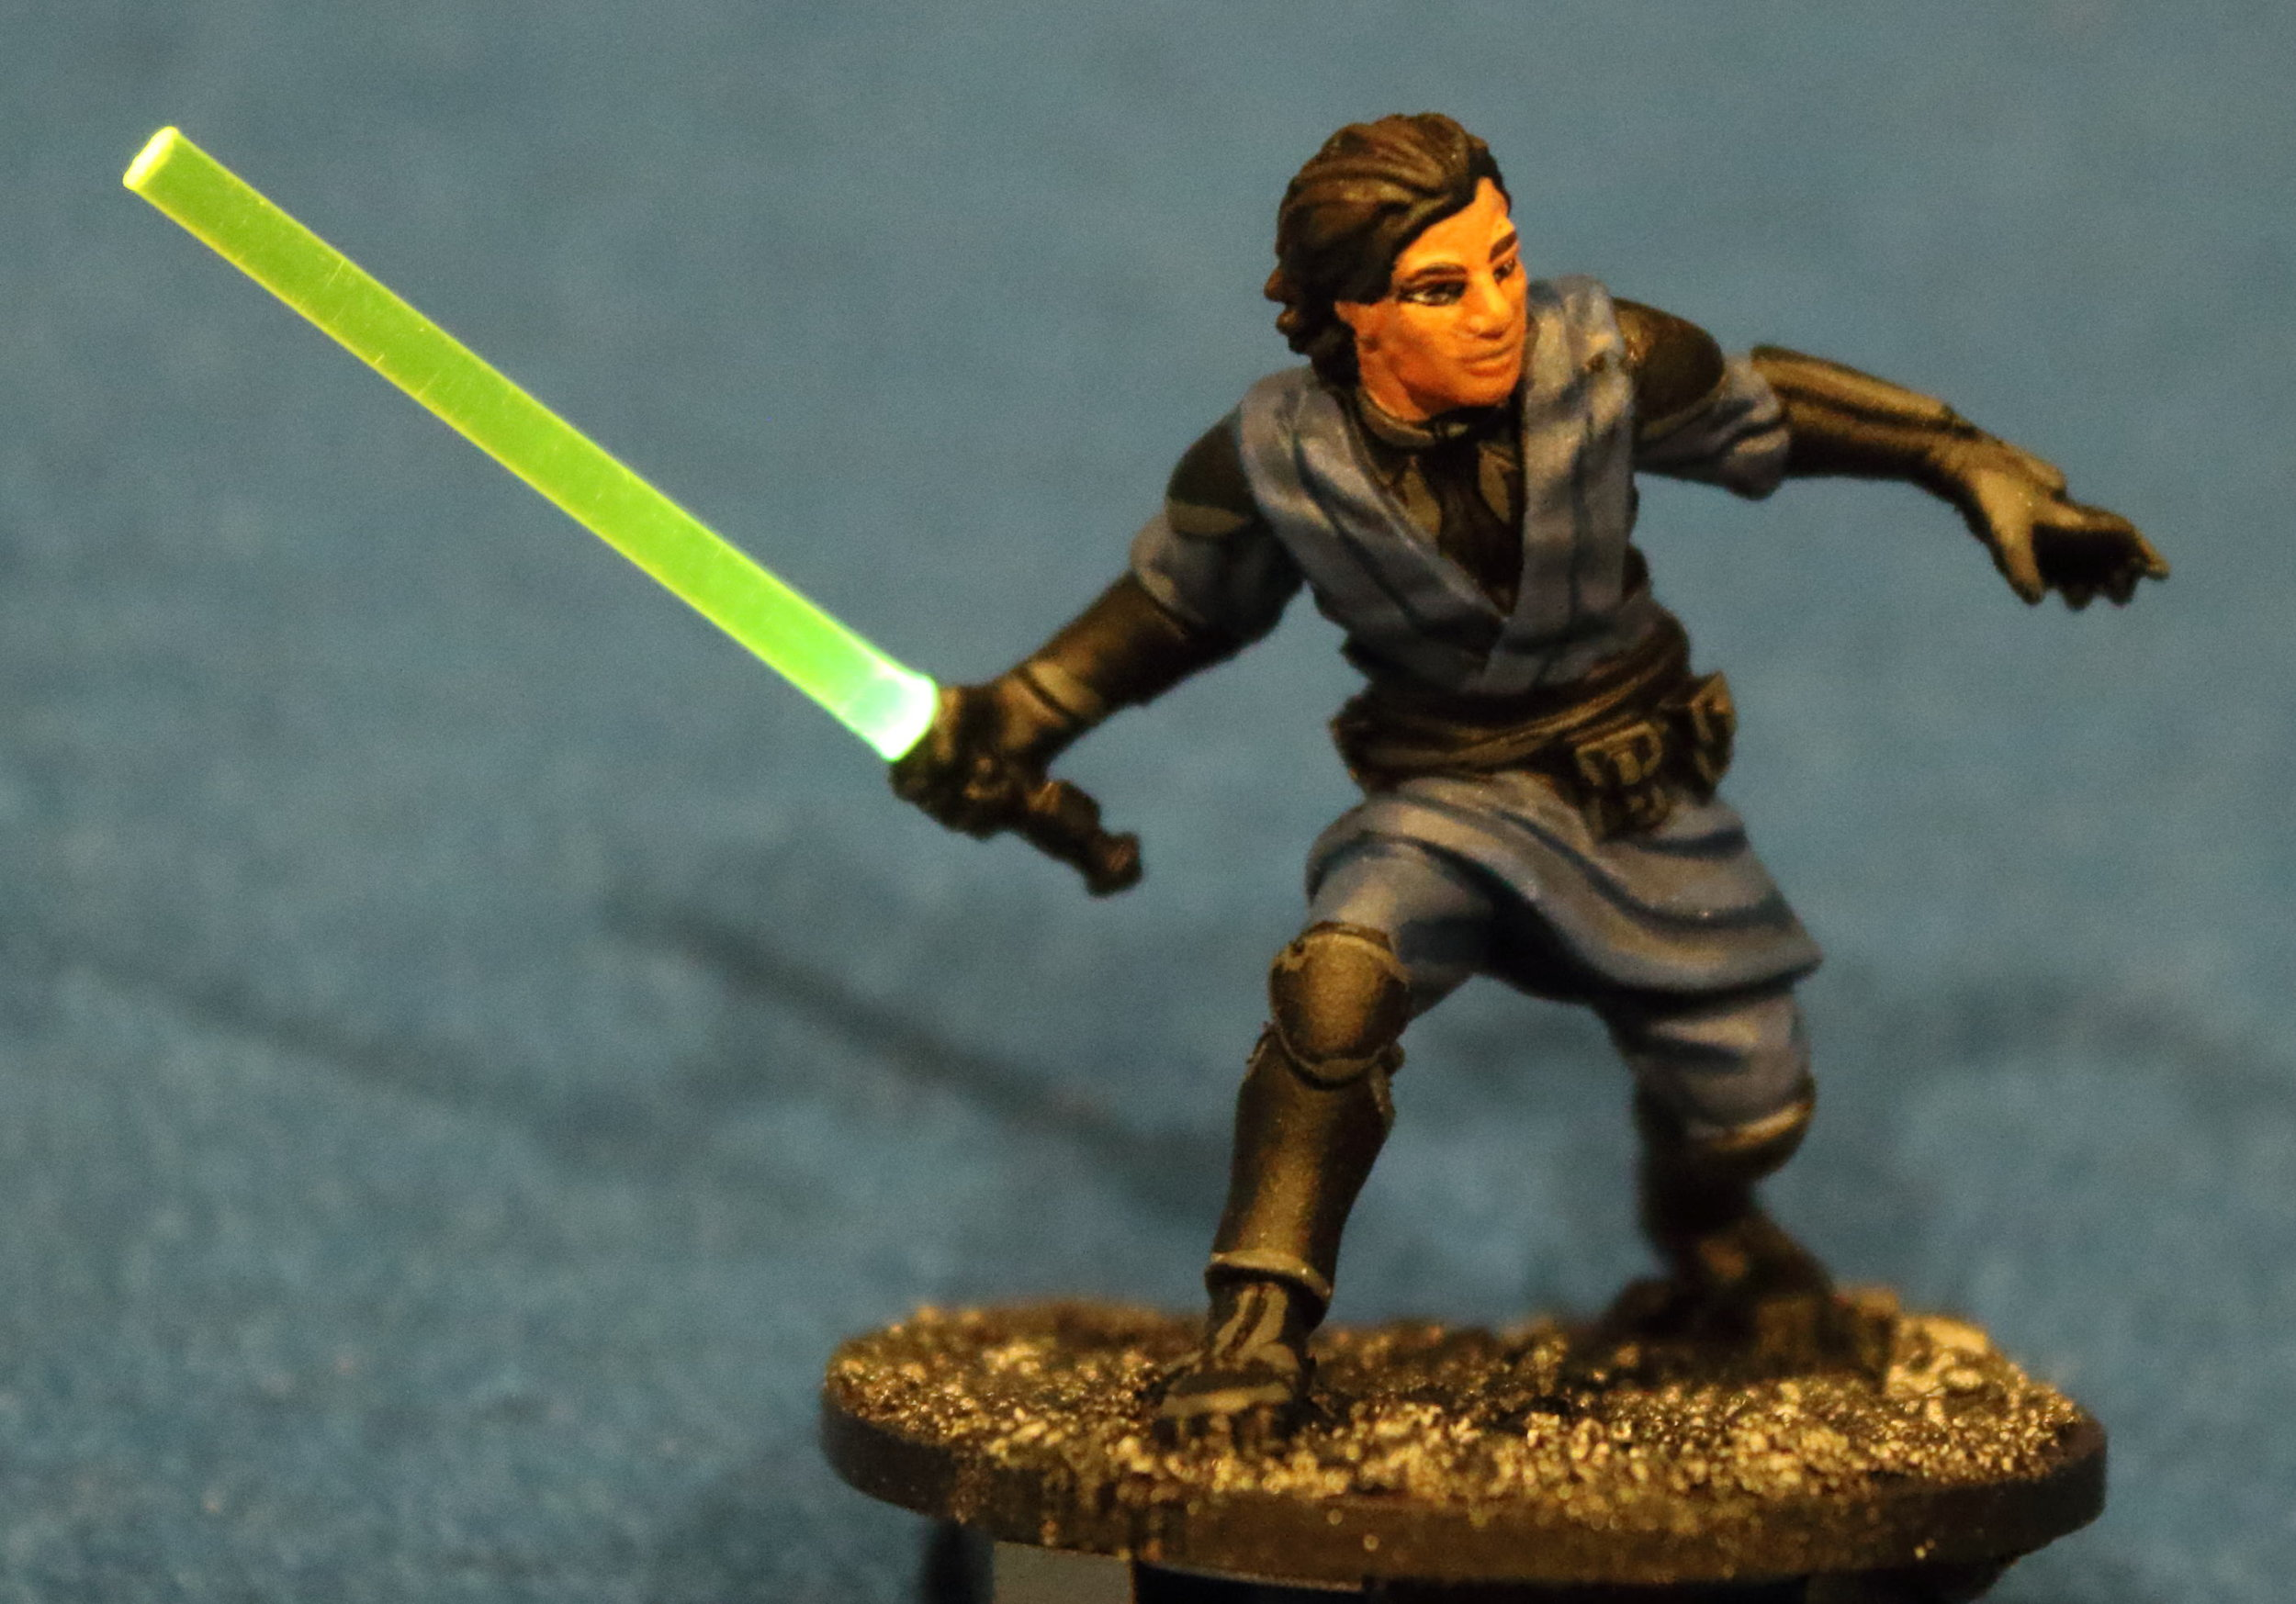 Imperial_Assault_Board_Game_LED_lightsaber_miniature_15.jpg